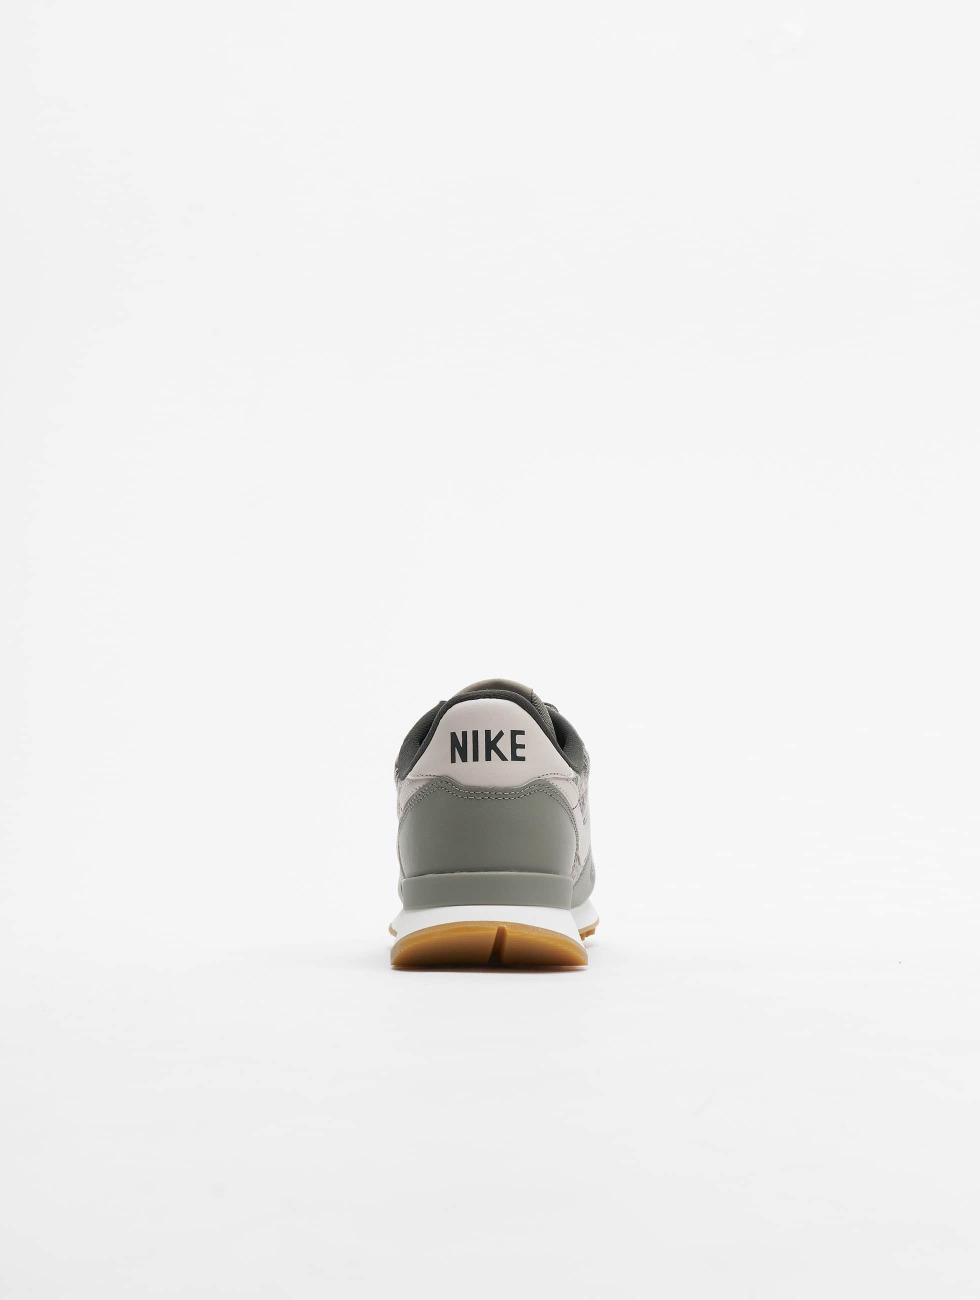 Nike schoen / sneaker Internationalist in groen 403313 Klaring Te Koop Korting Kopen X92I9l